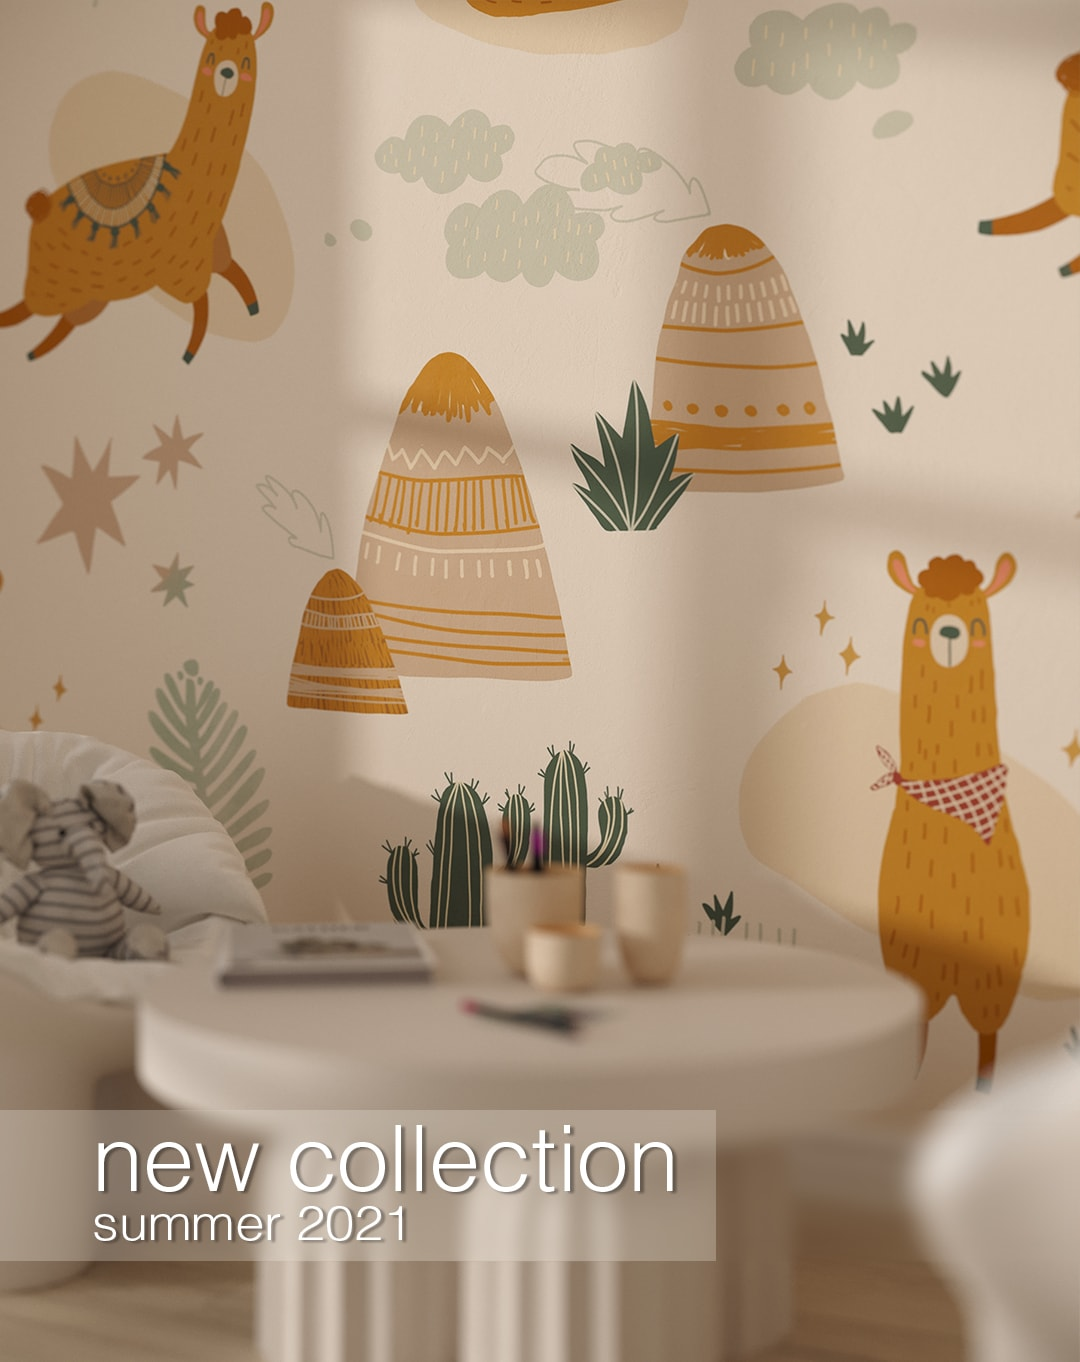 new collection fototapet summer-2021 kith2kin